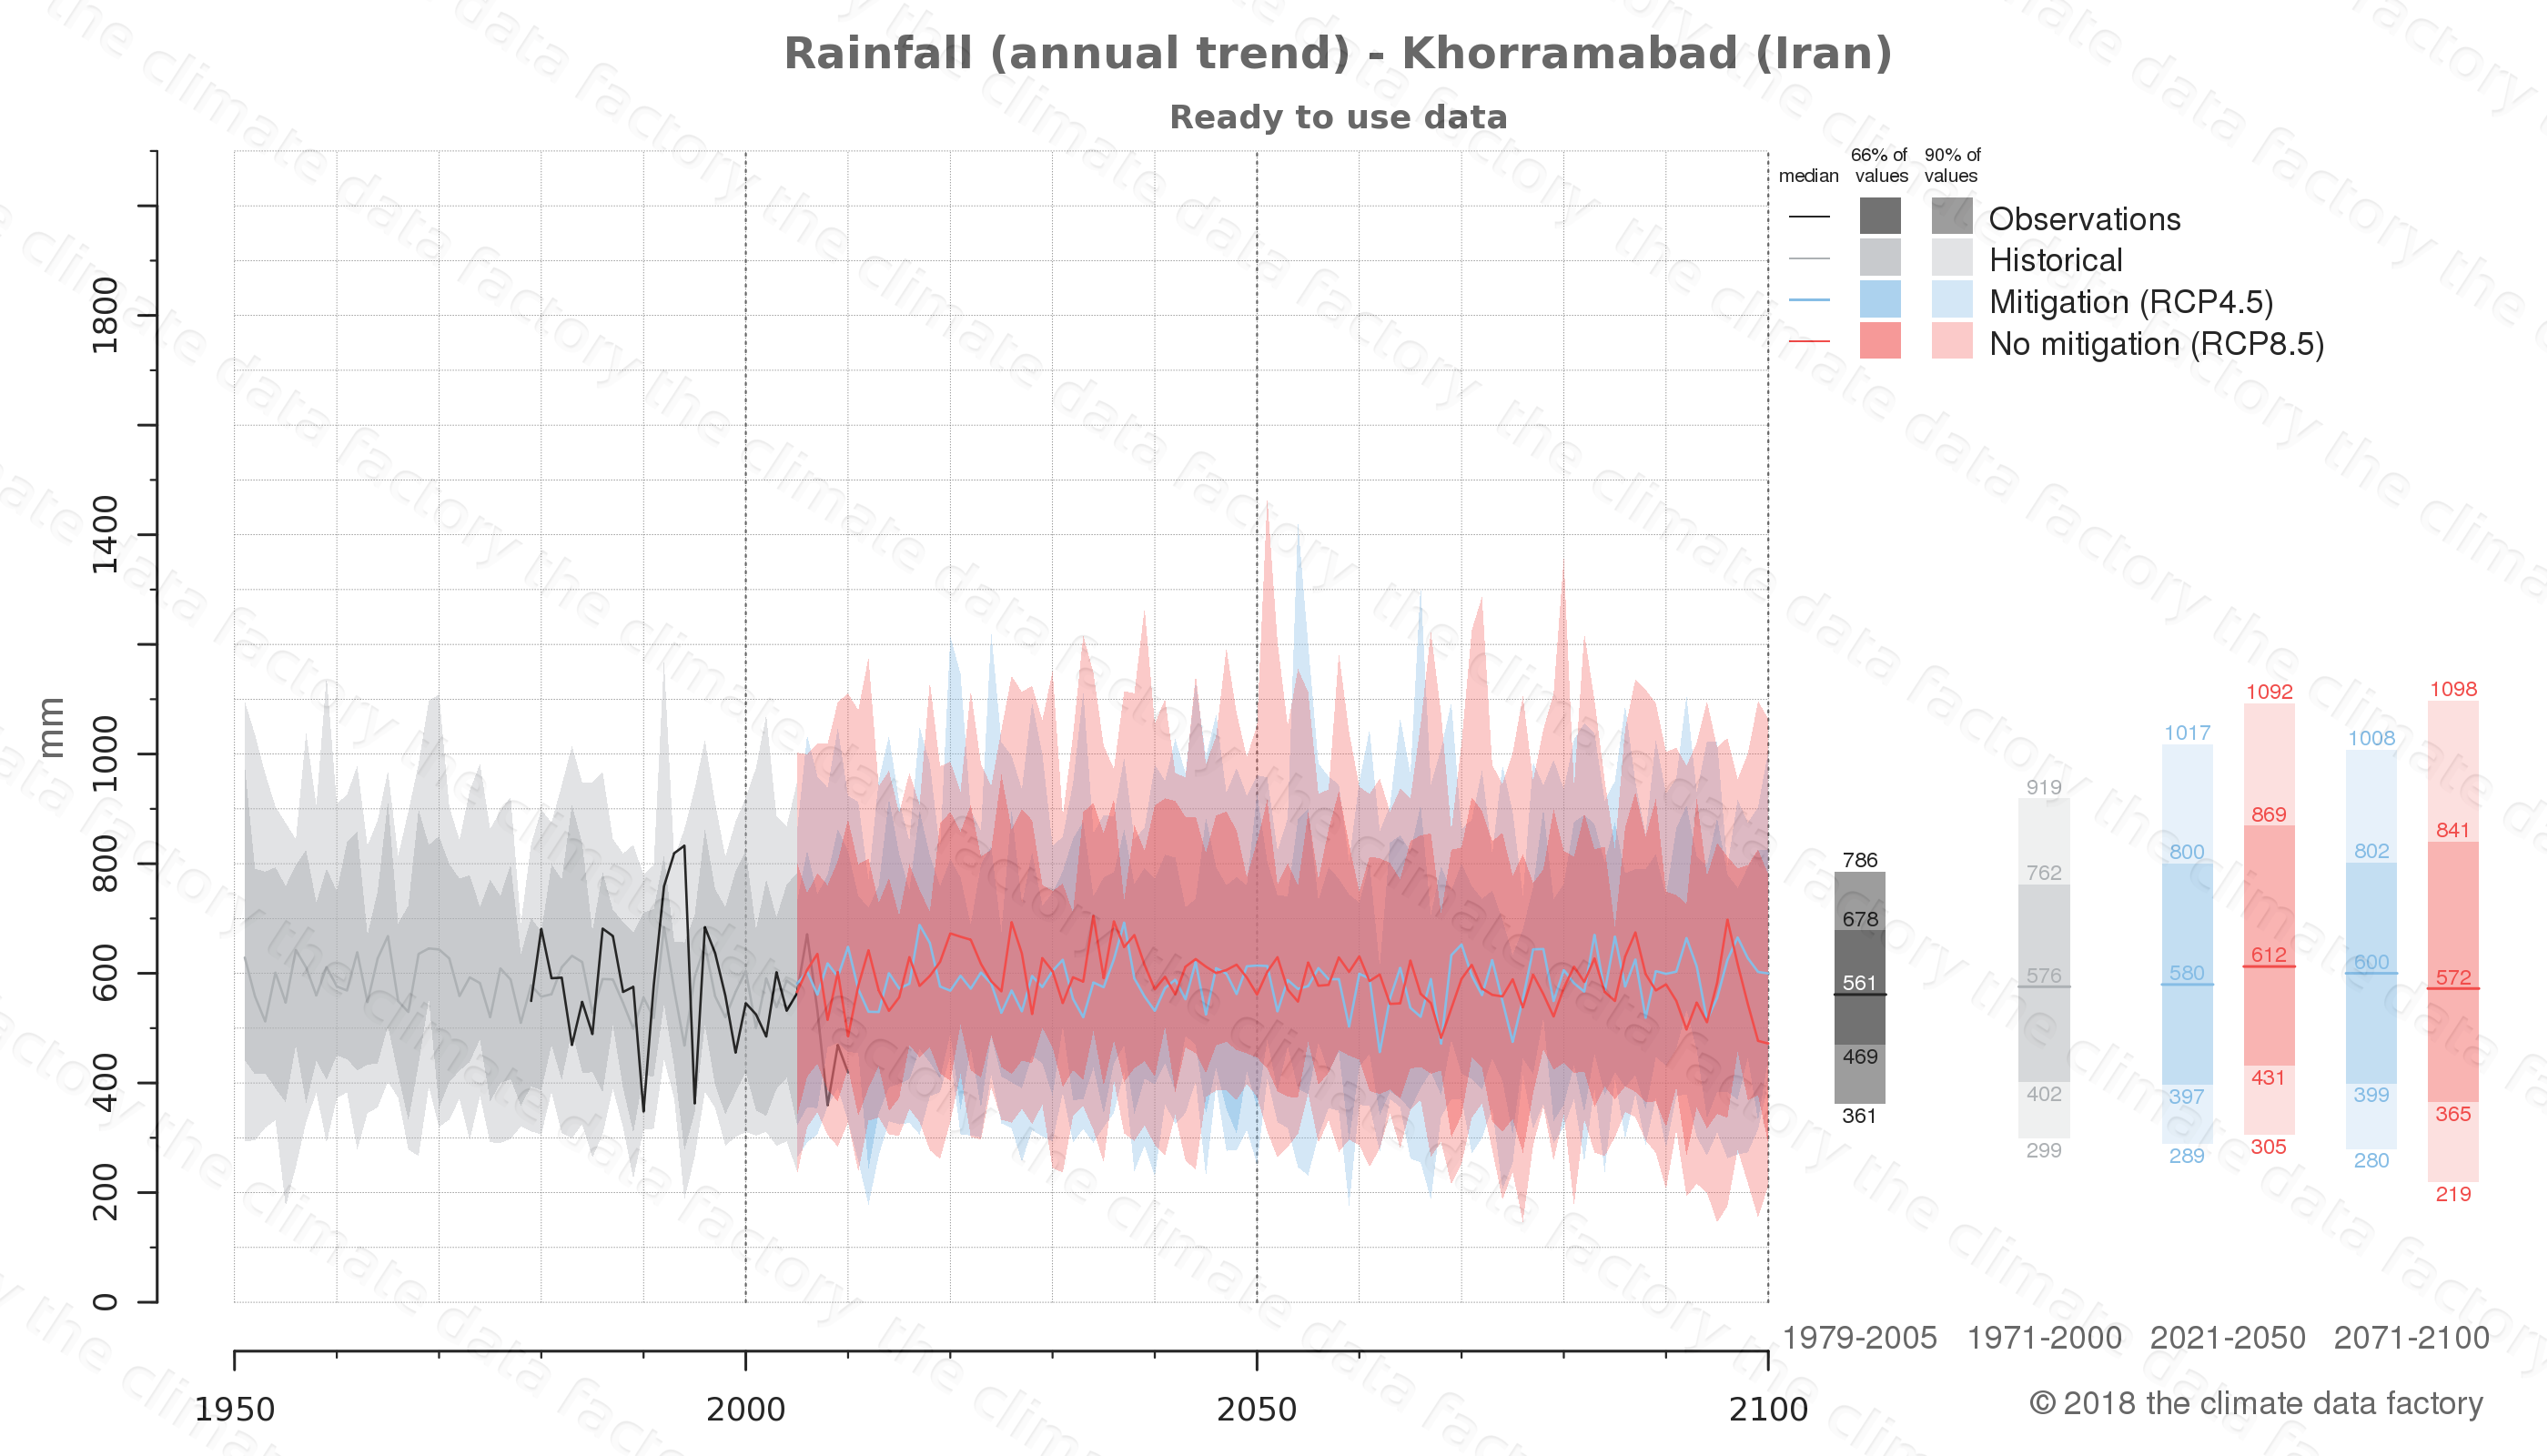 climate change data policy adaptation climate graph city data rainfall khorramabad iran